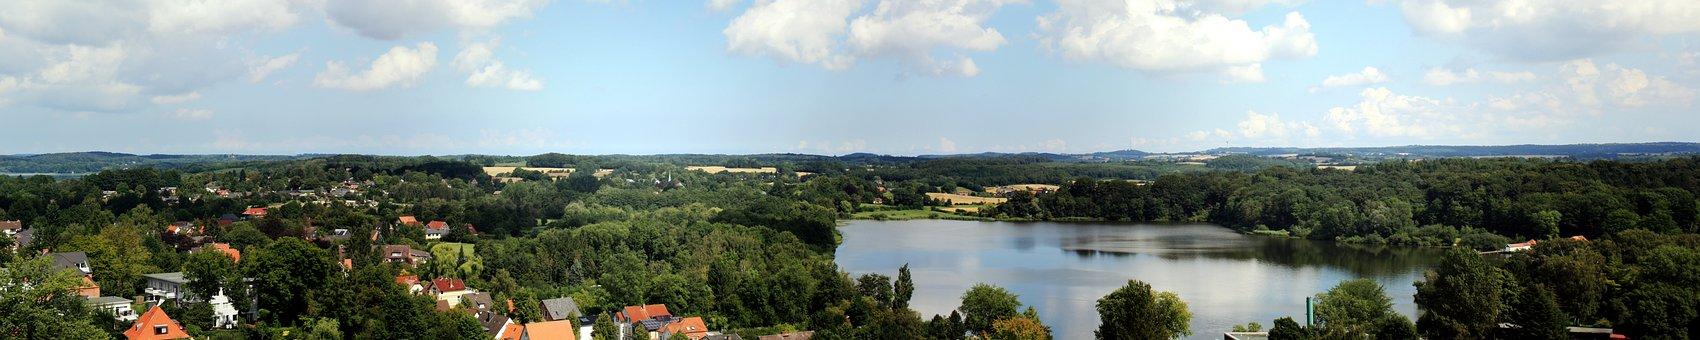 Panorama, Panoramic Image, Nature, Waters, Landscape